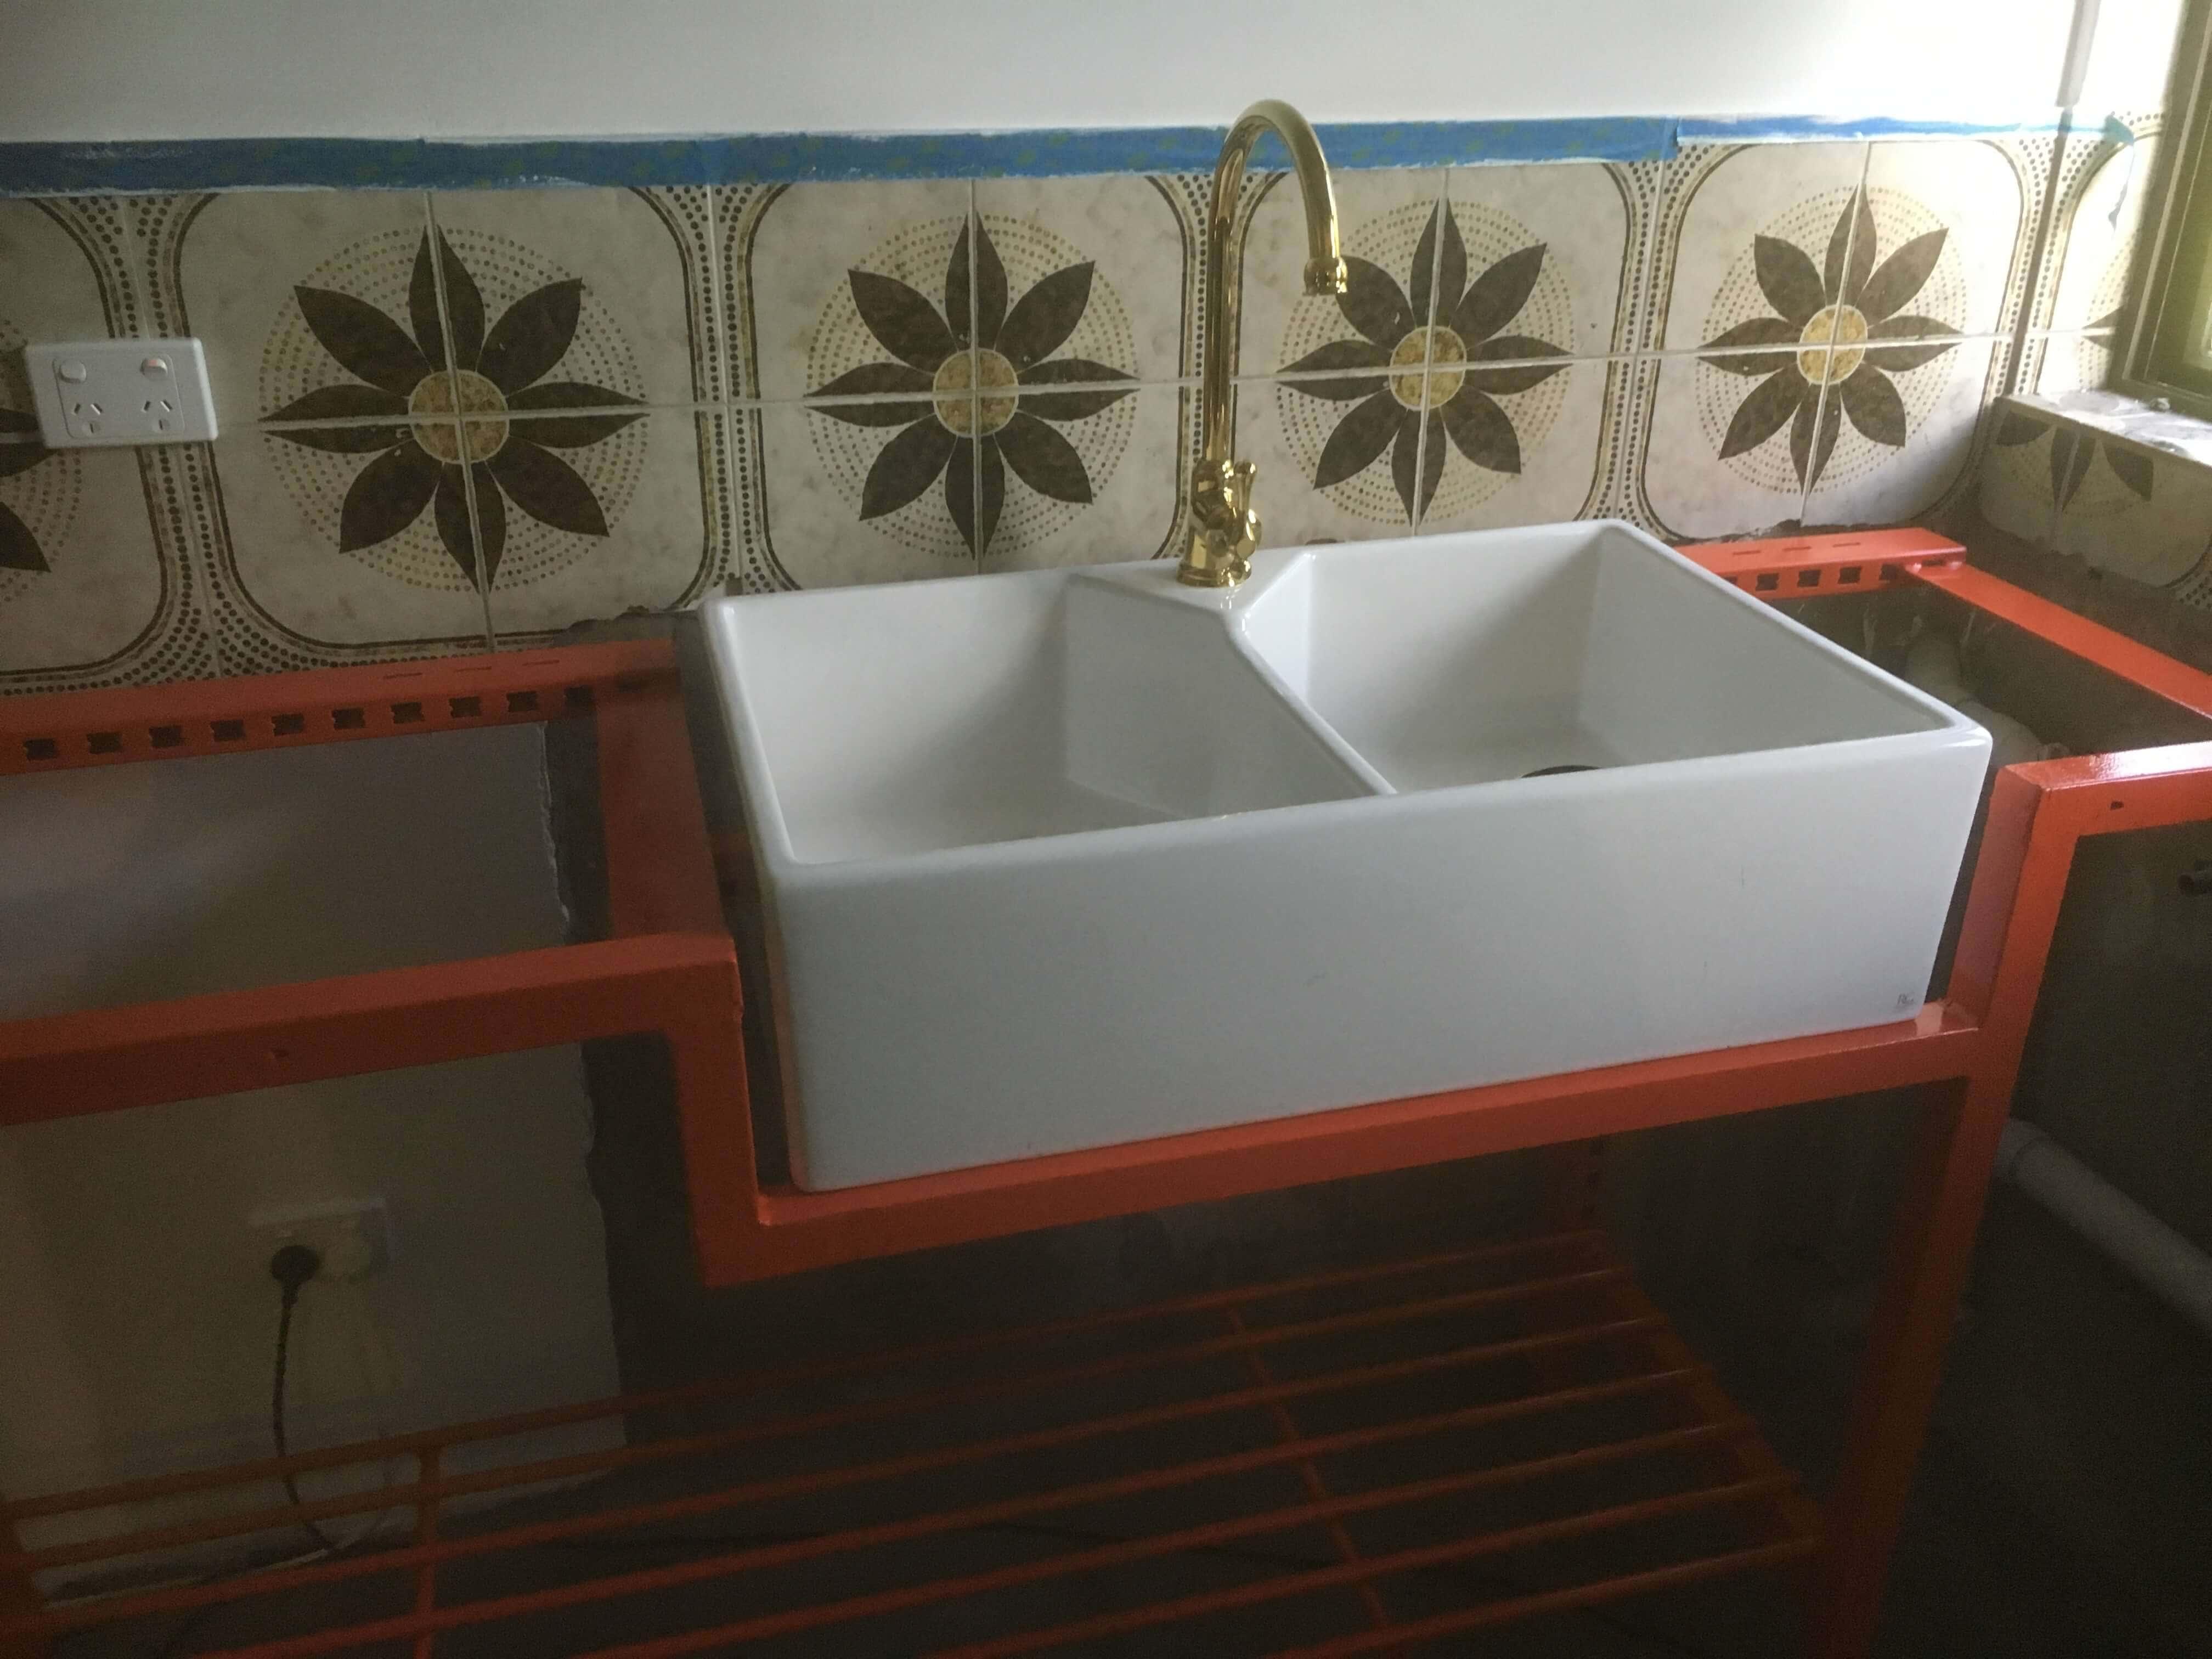 Everyday Plumbers Residential Sanitary Fixtures Repairs and Maintenance 1579